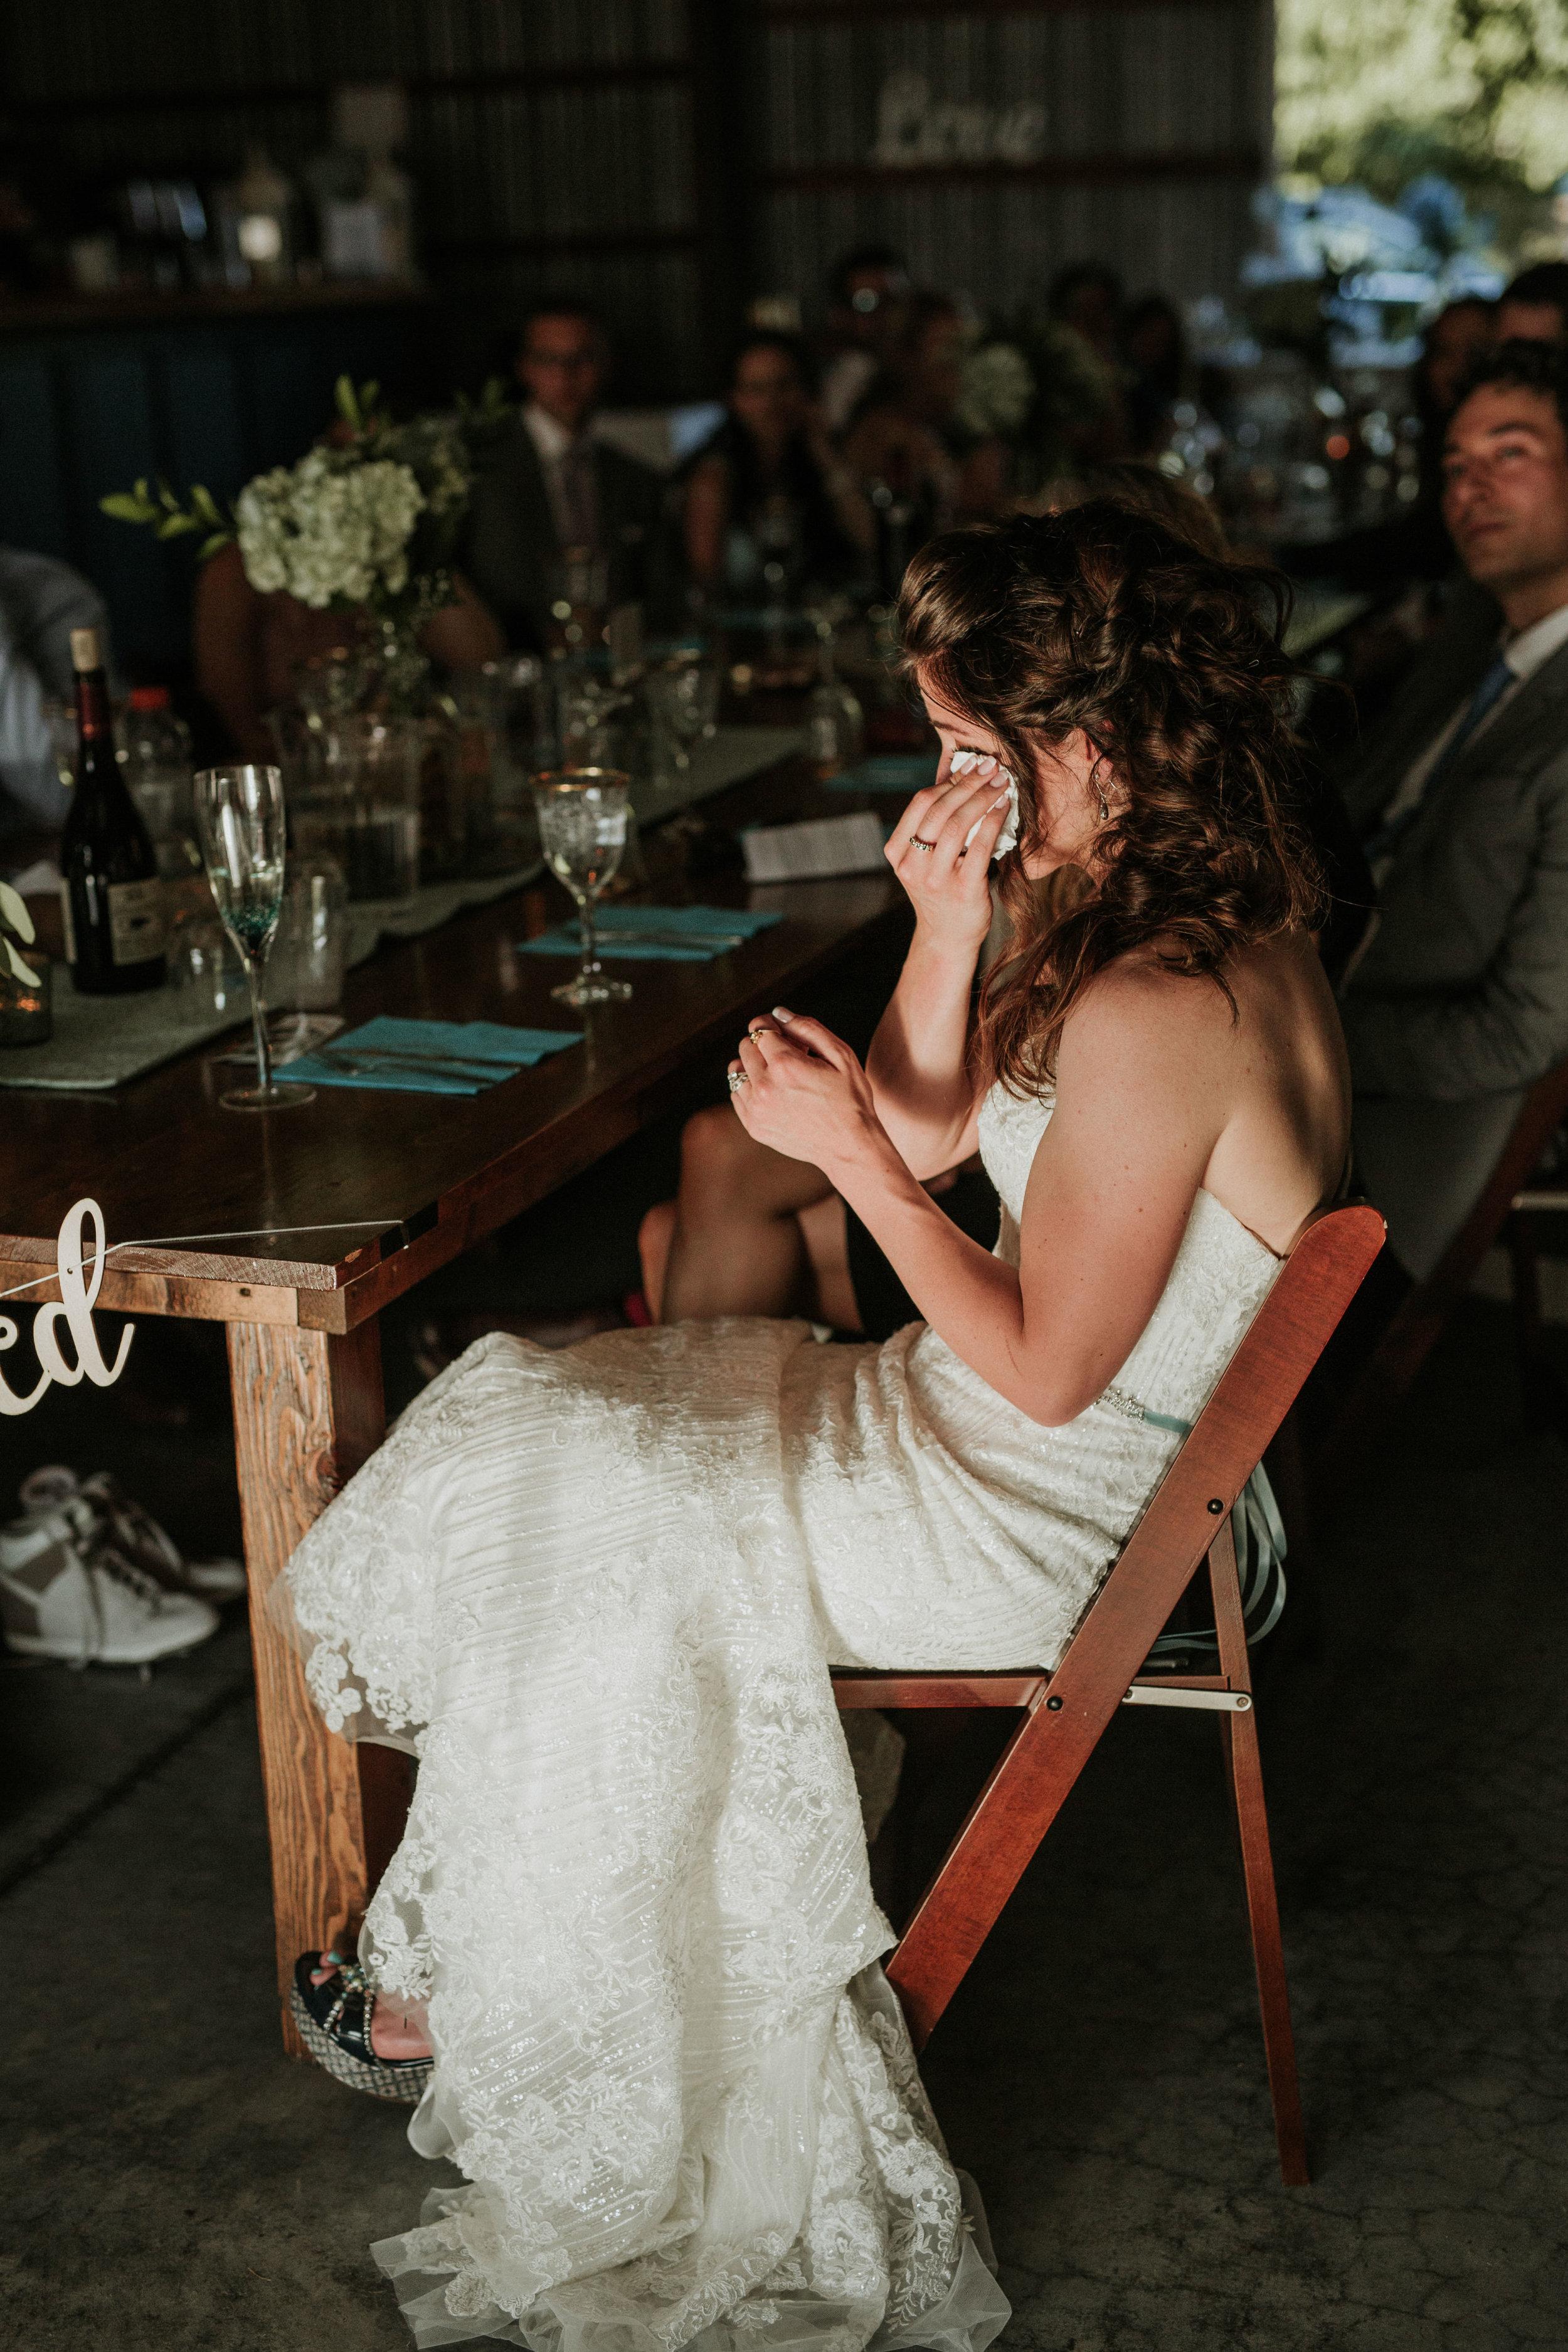 nostrano_vineyards_wedding_0069.JPG